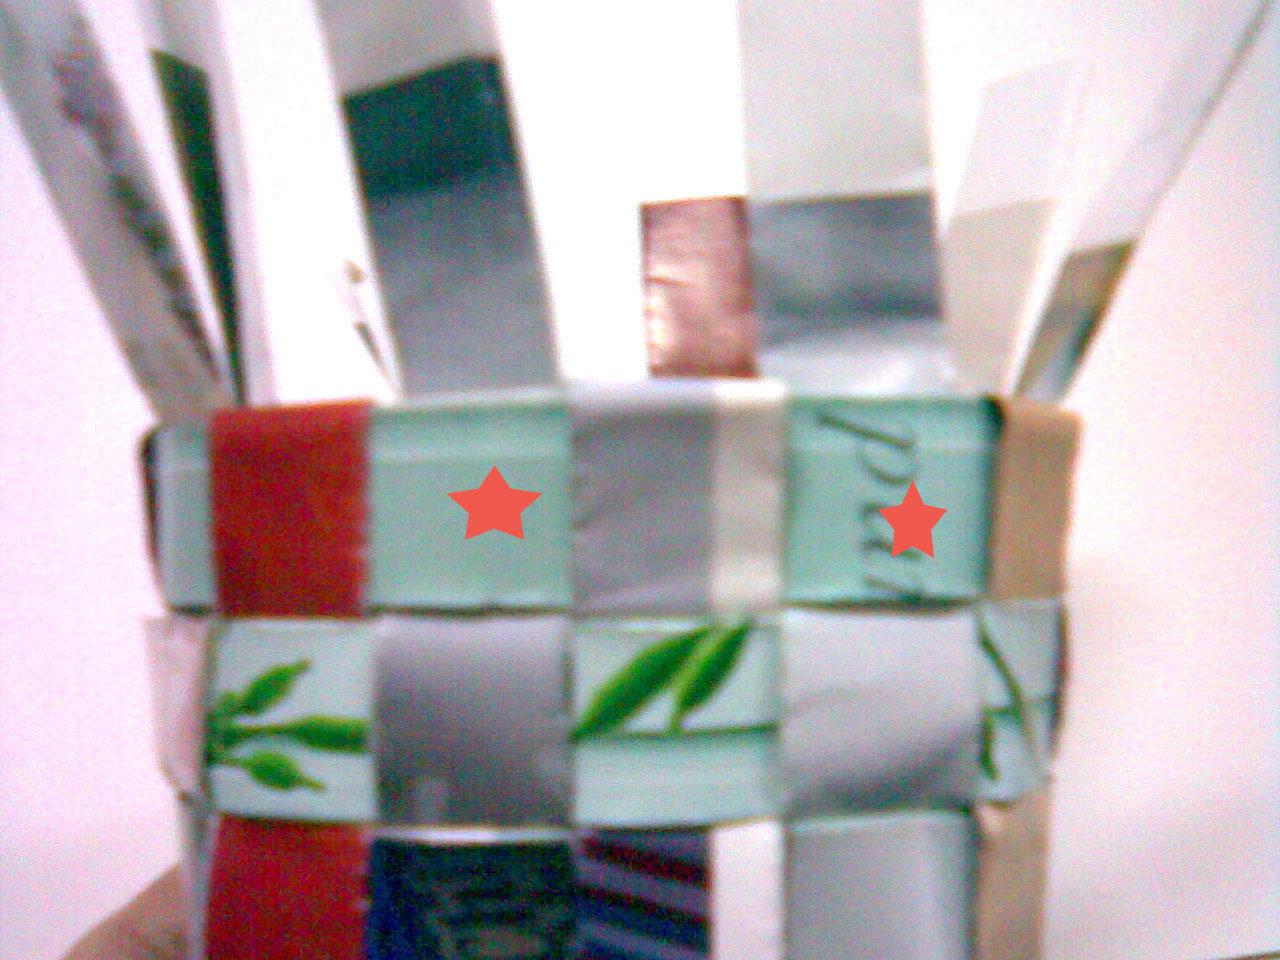 la forma de armadura de cesta Cómo hacer una cesta con asa de documentos, cesta tejida diy   論文からハンドルとバスケットを作る方法織りバスケットに、DIYは、バスケットを織り方法   কিভাবে বুনা বাস্কেট পত্রিকা থেকে কিভাবে হ্যান্ডেল একটি বাস্কেট করতে, DIY বোনা ঝুড়ি วัสดุเหลือใช้,จากของเหลือใช้,ทำจากกระดาษ,ทำจากหลอดกาแฟ,ตะกร้าจากหลอดกาแฟ,วิธีพับหลอดกาแฟเป็น,พับหลอดกาแฟ ของใช้,ทำหลอดกาแฟเป็น,โครงงาน จากหลอดกาแฟ